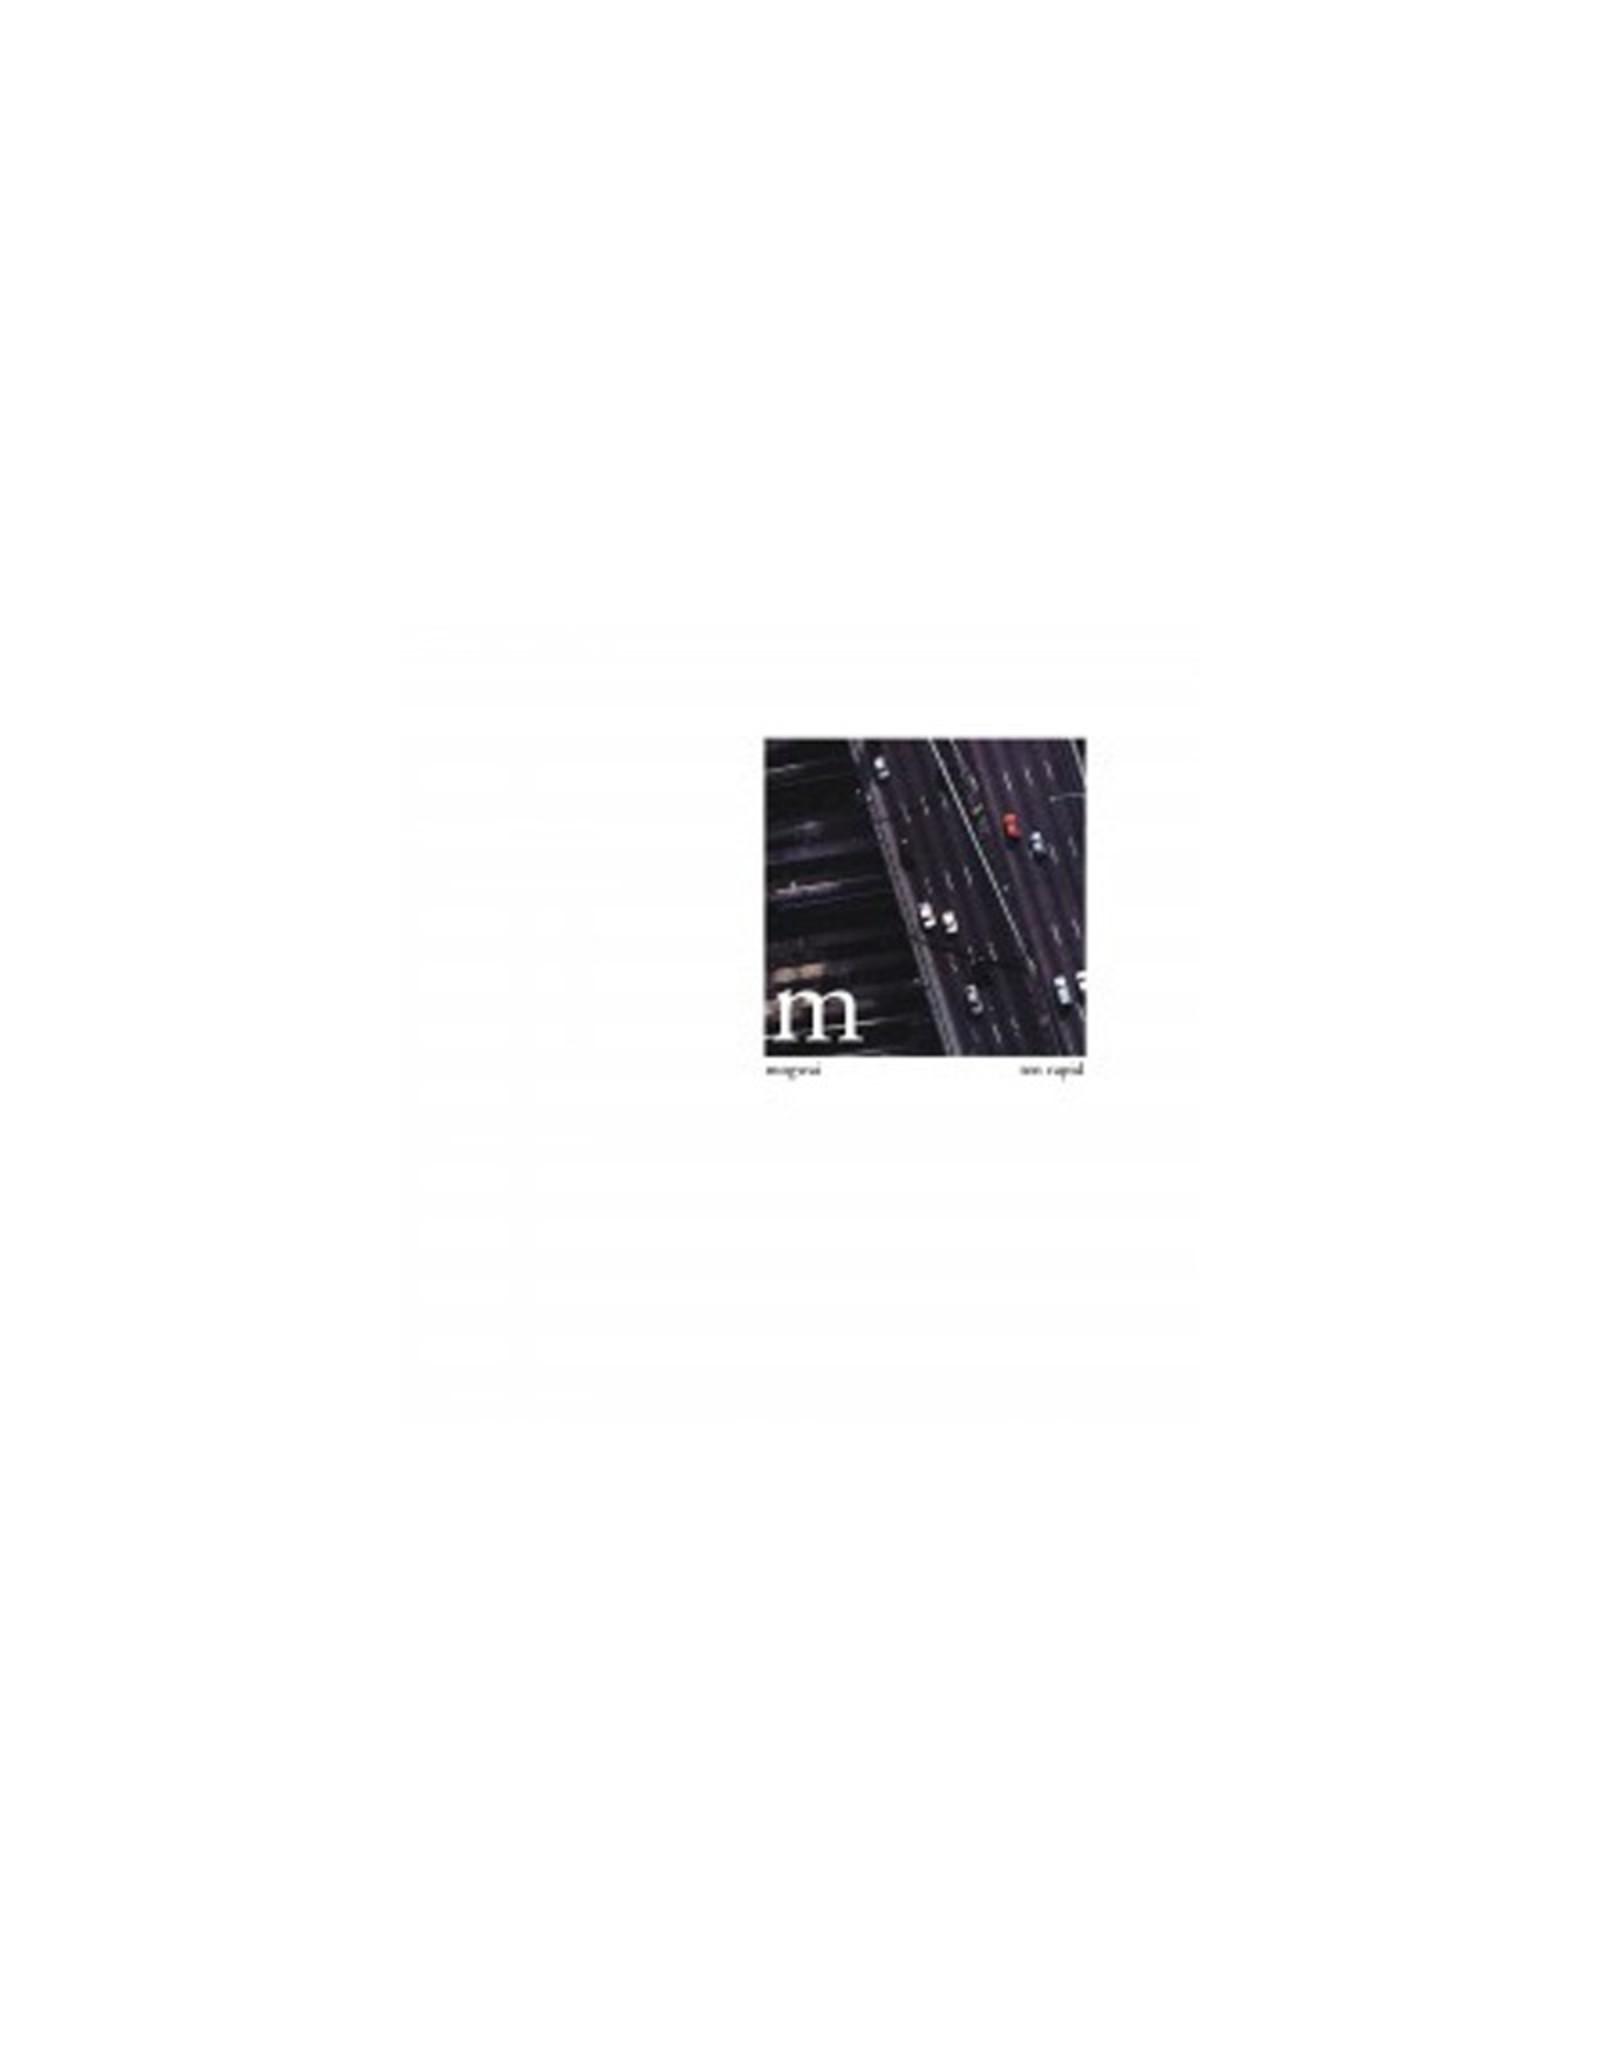 New Vinyl Mogwai - Ten Rapid (Collected Recordings 1996-1997) LP